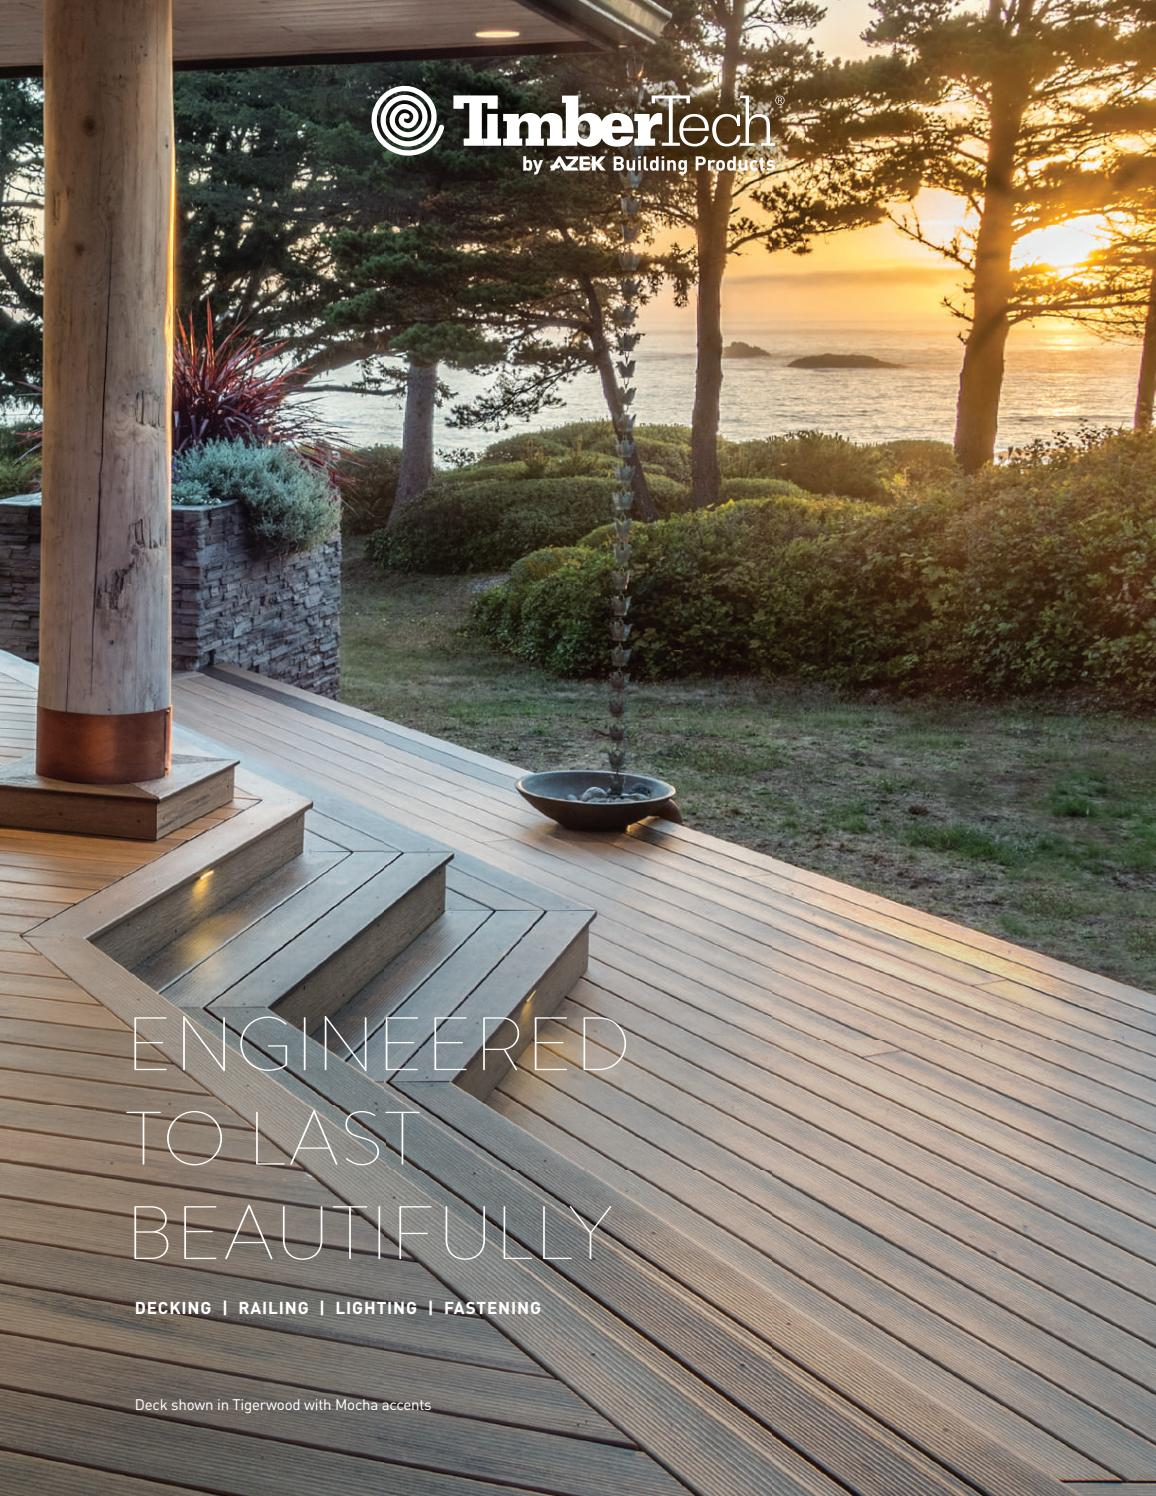 TimberTech Brochure 2017 by Meeks Lumber  Hardware  Issuu